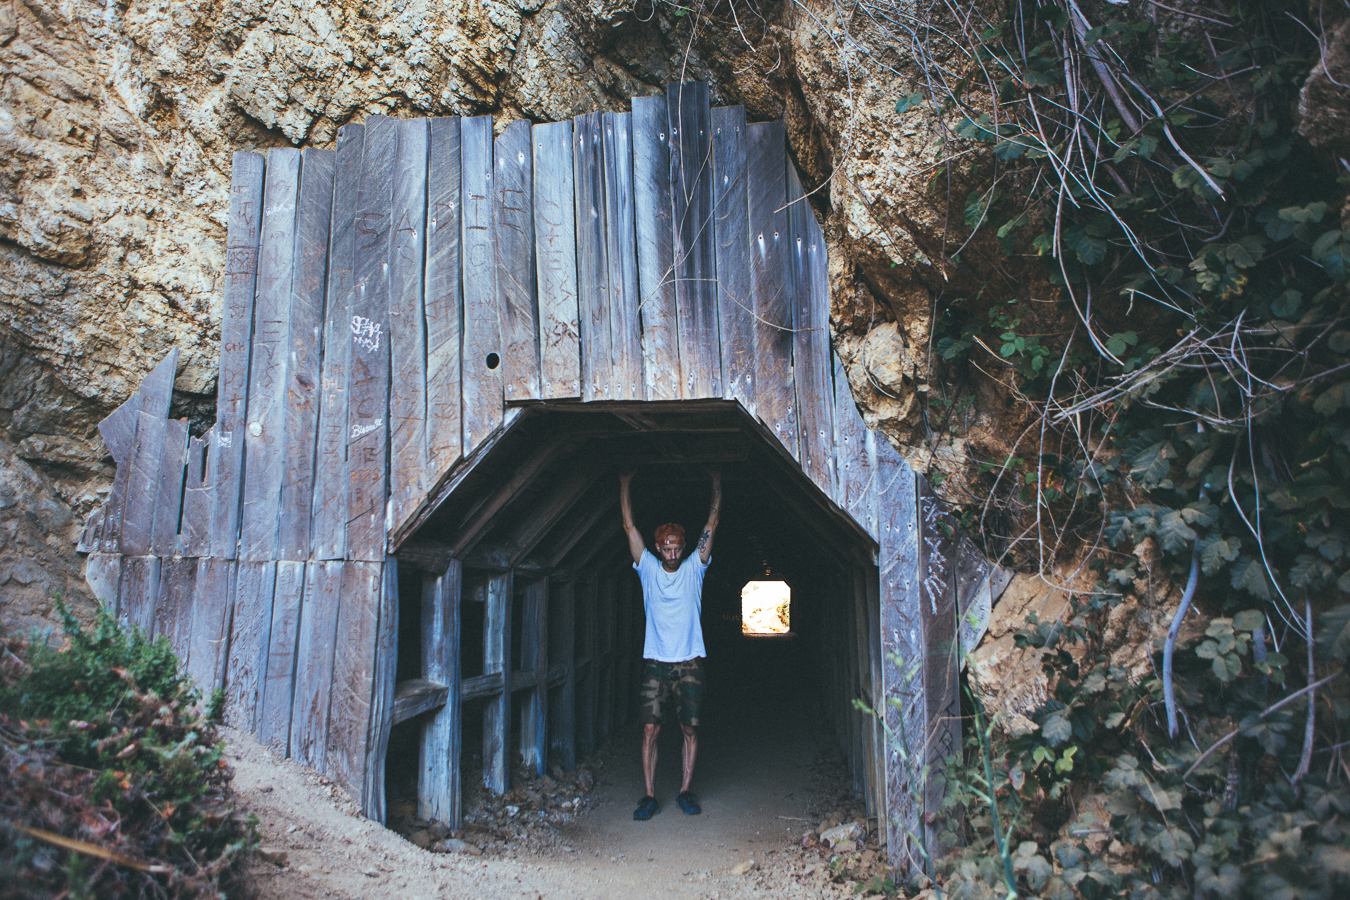 I found the mine to a secret cove.